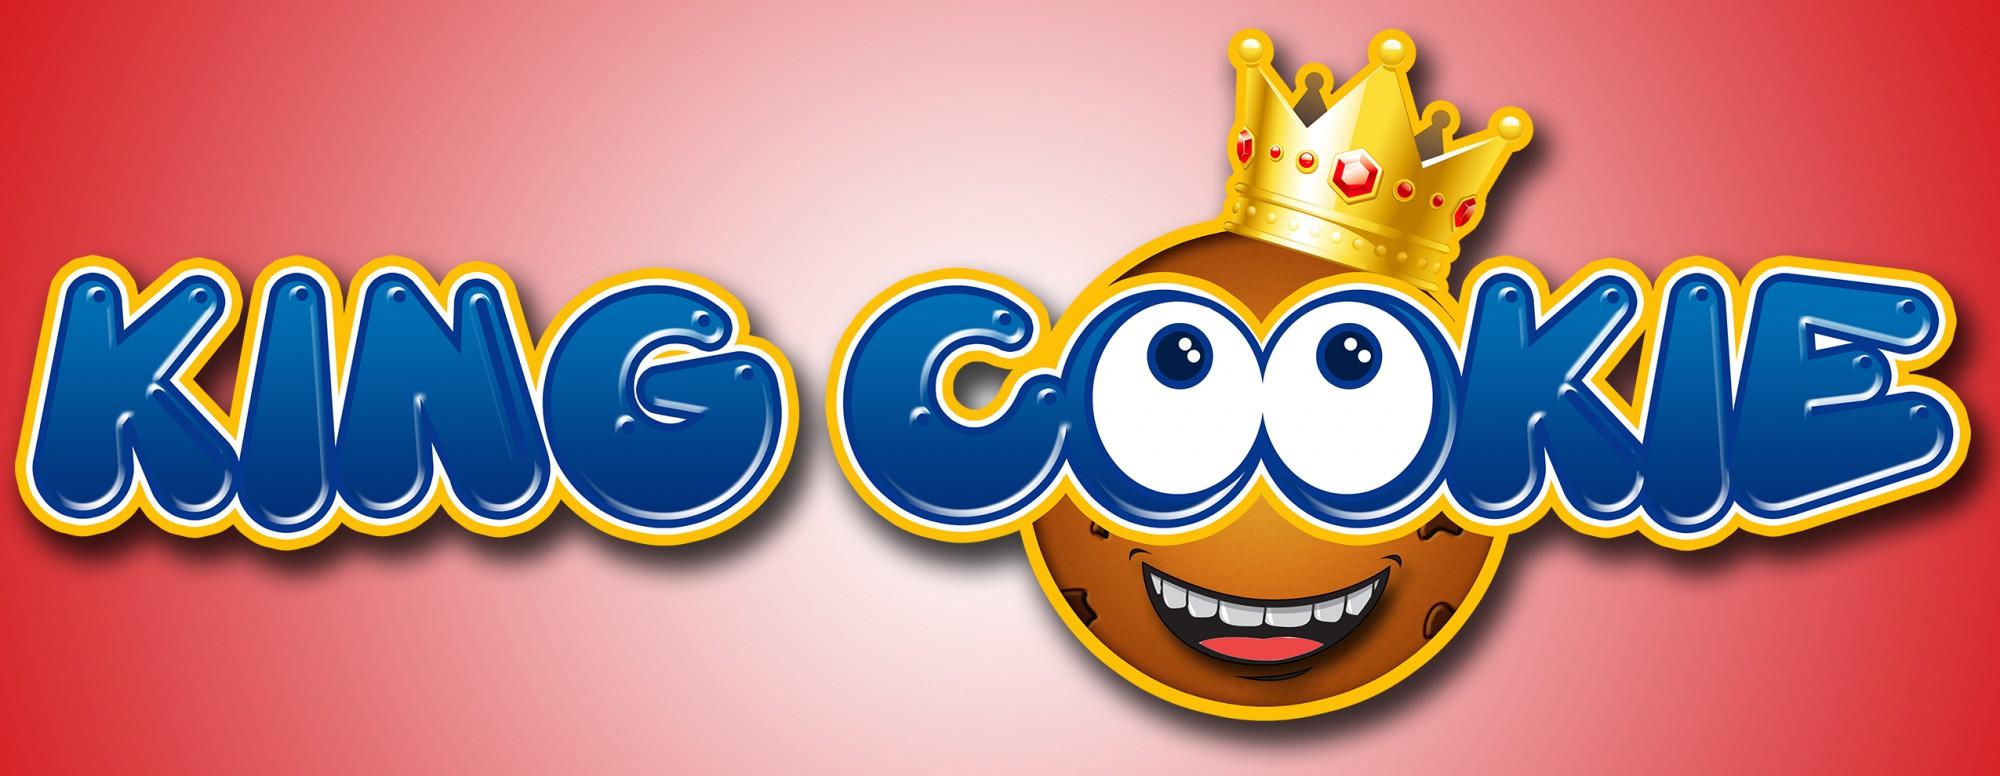 King Cookie